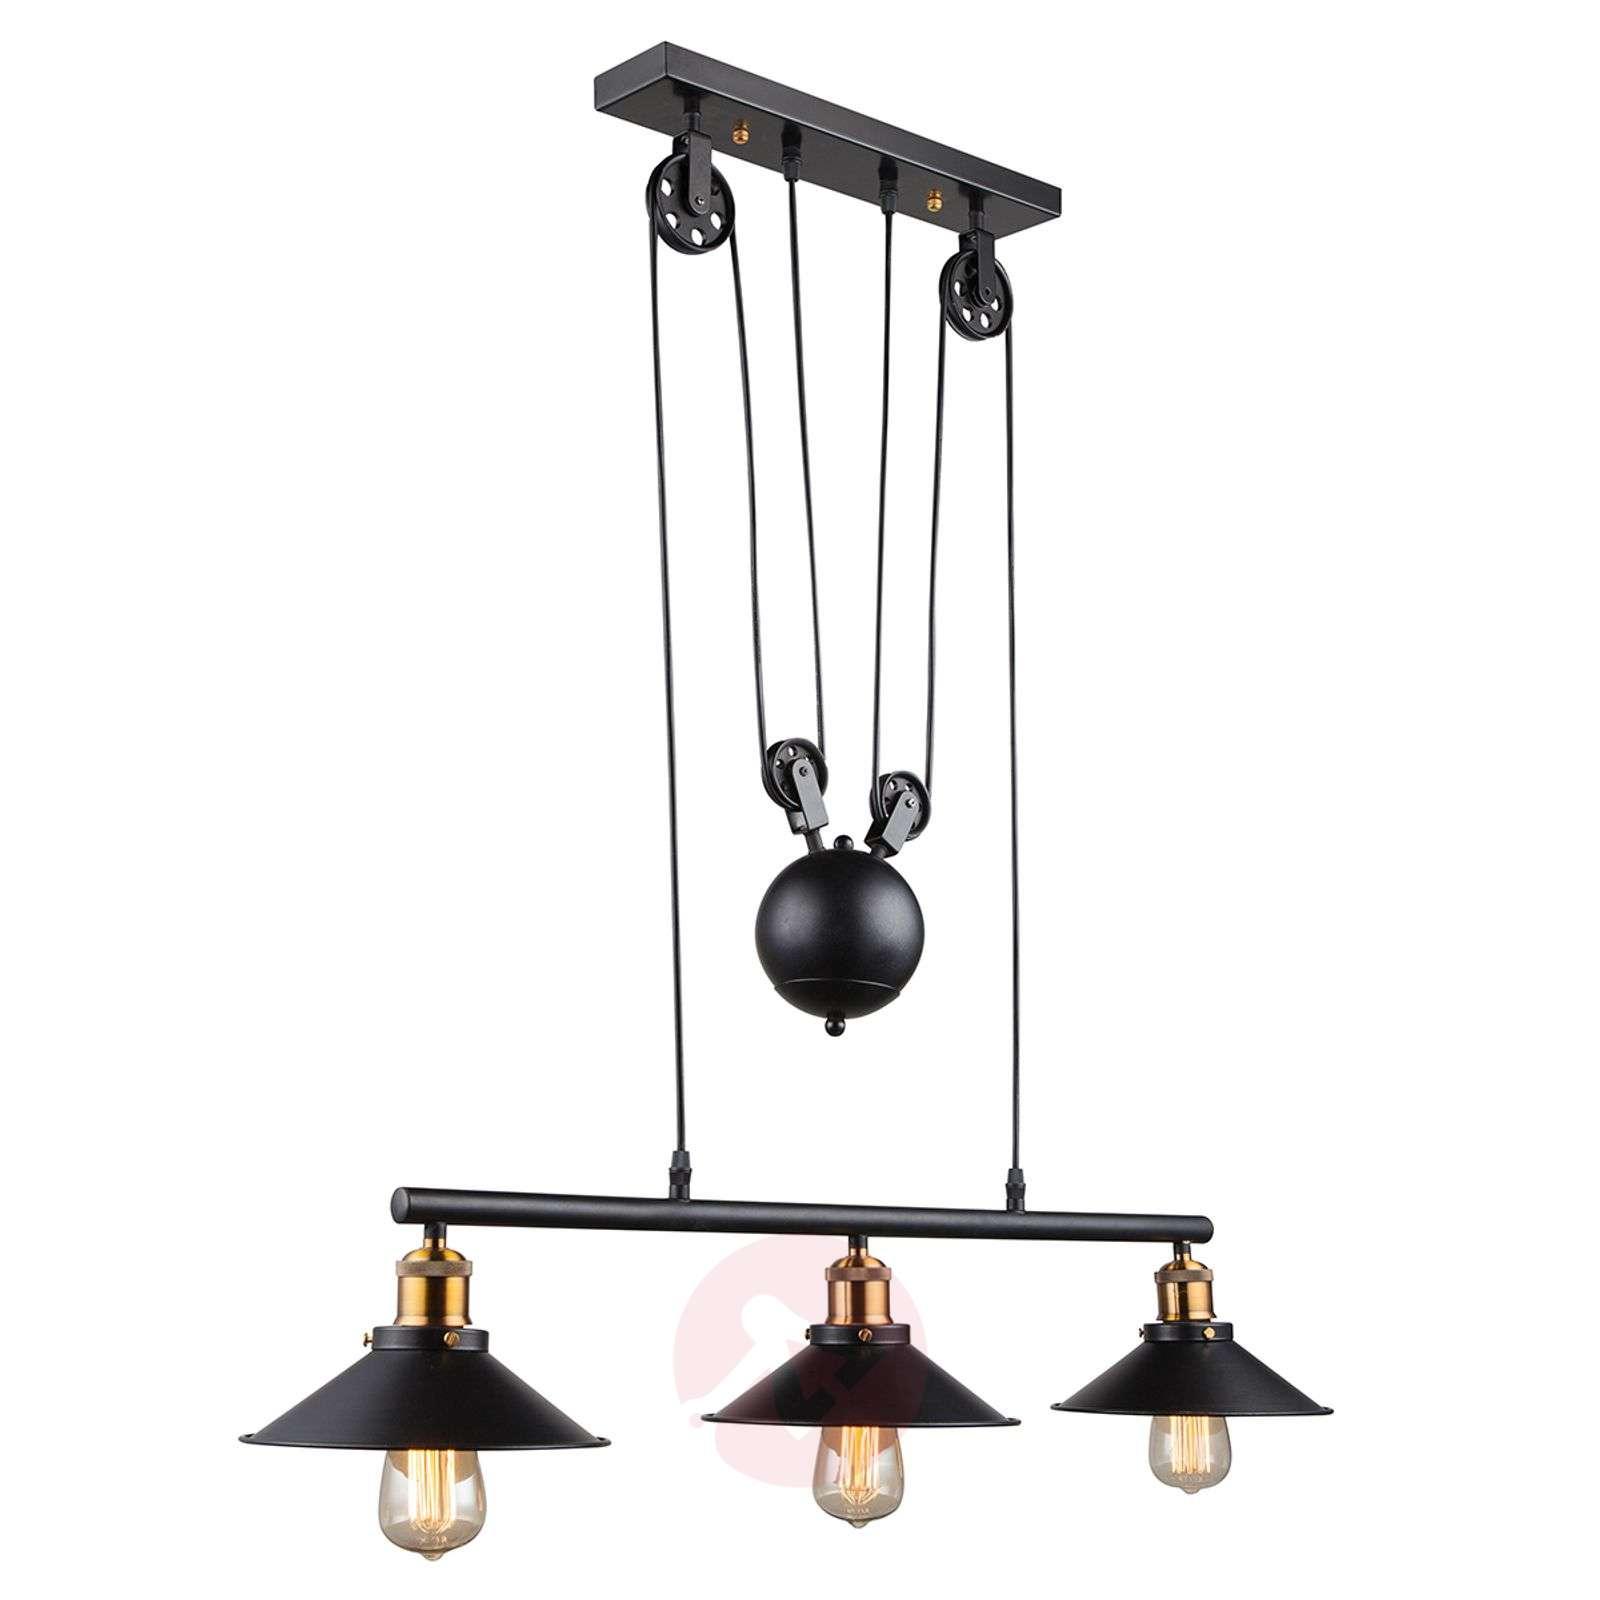 3-bulb pendant light Viktor height-adjustable-4014869-02